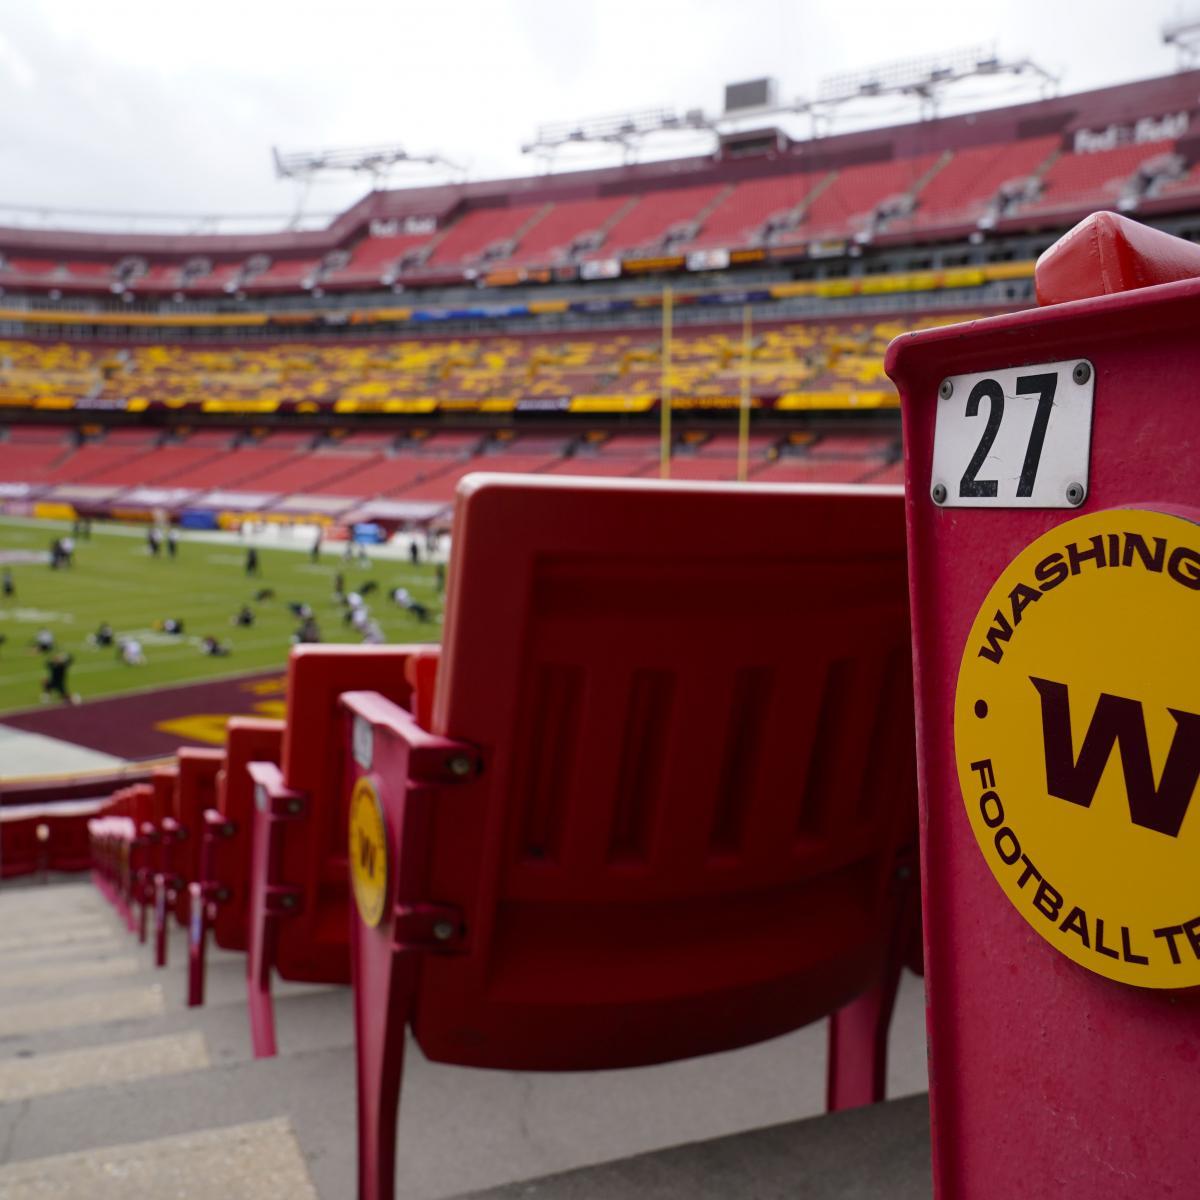 Washington Football Team Teases New Nickname, Rebrand for 2022 NFL Season